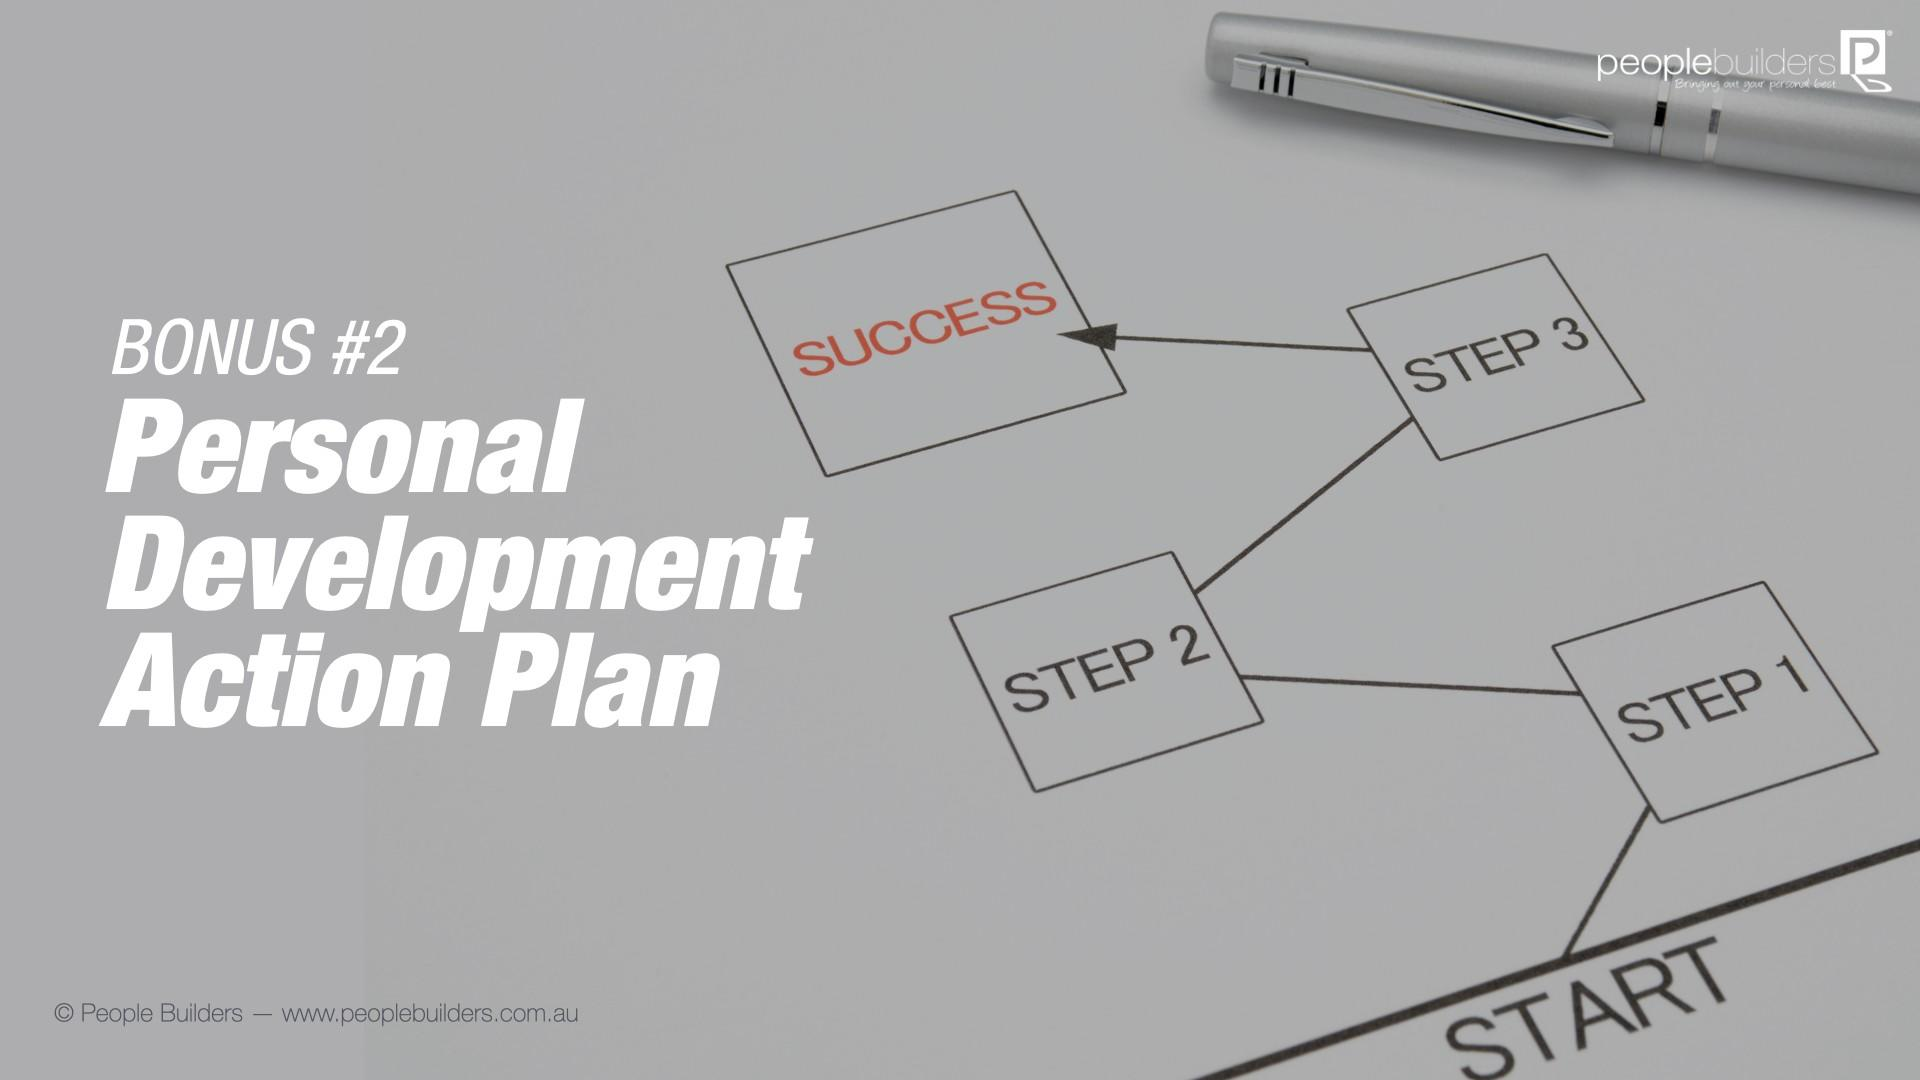 Bonus#2: Personal Development Action Plan